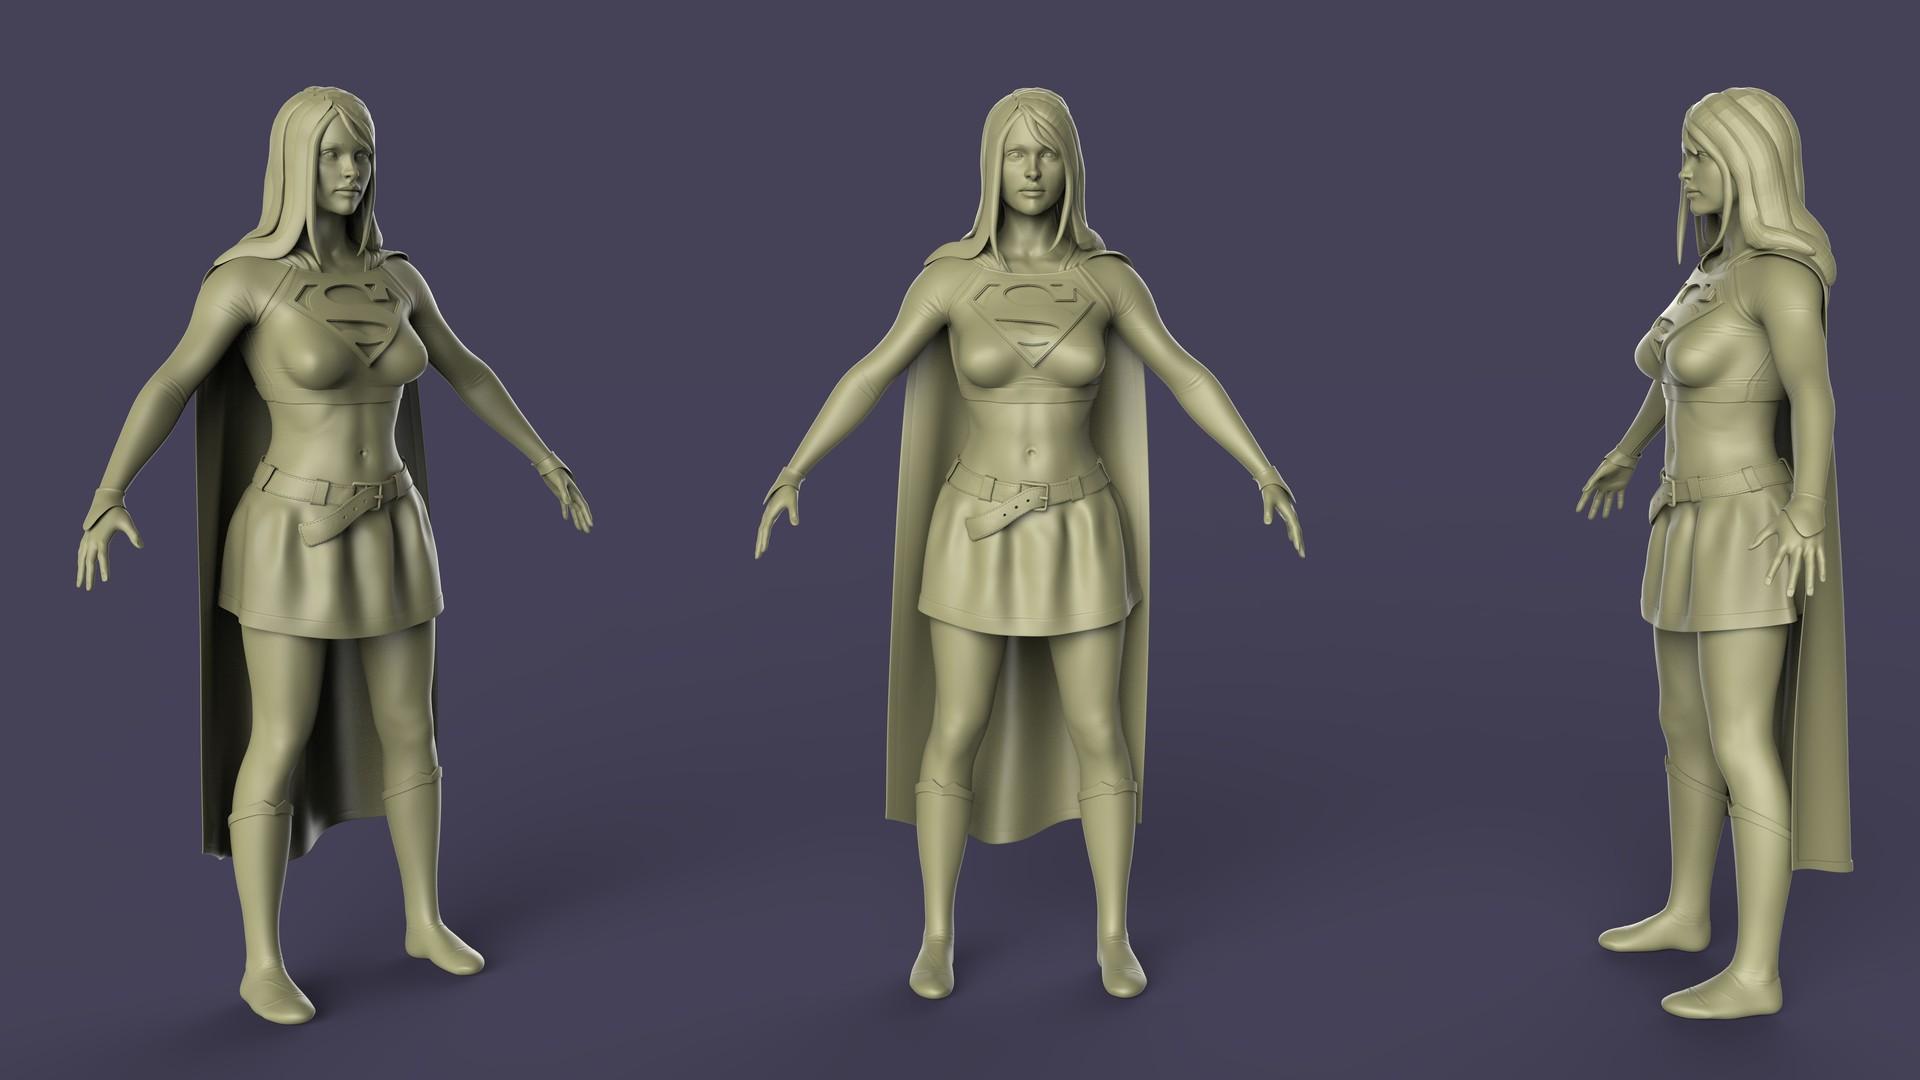 ZBrush high resolution sculpt rendered in Keyshot